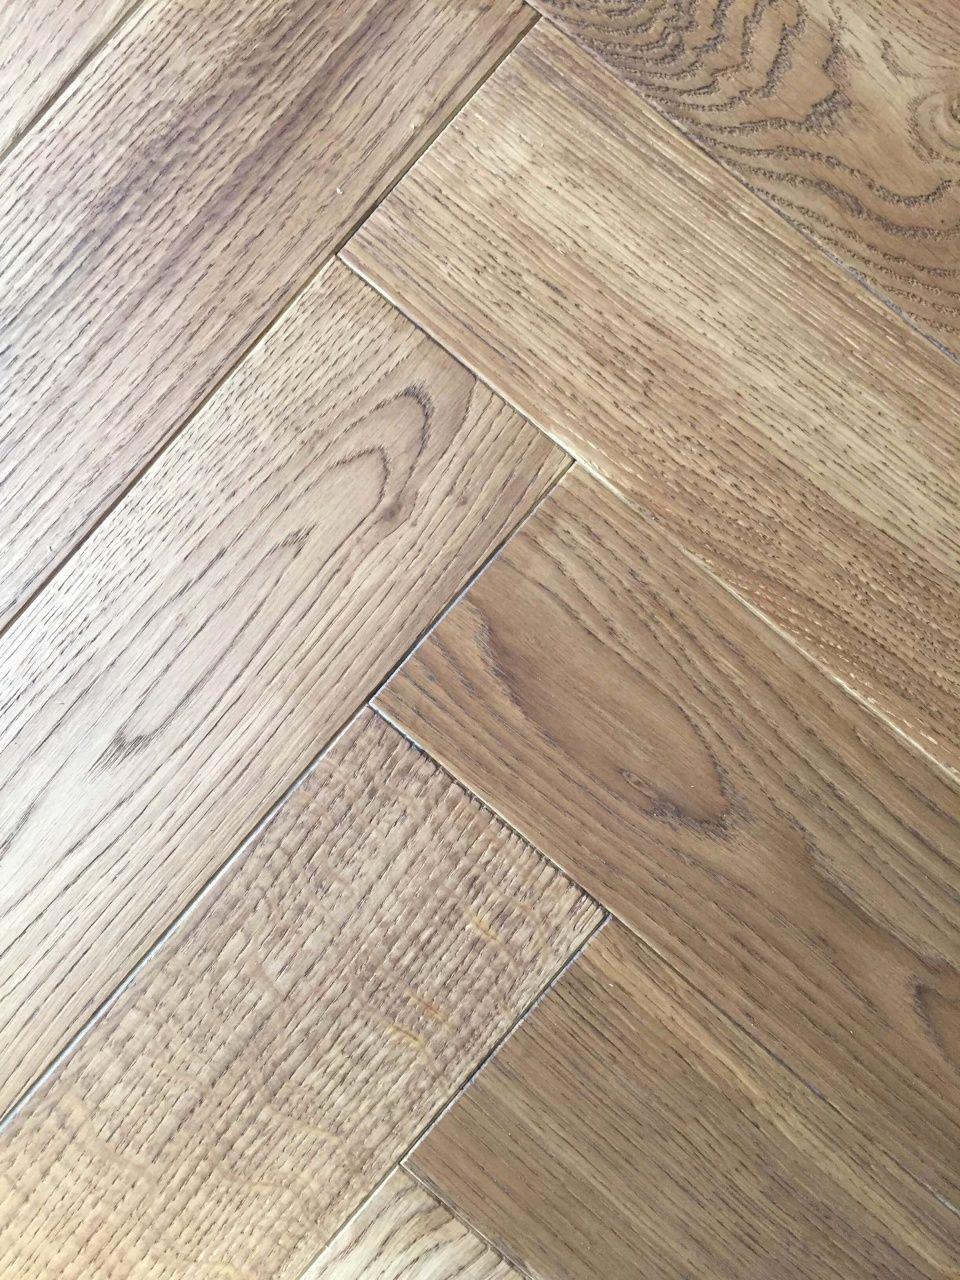 How Much Does It Cost To Install Vinyl Plank Flooring Engineered Wood Floors Wood Laminate Flooring Flooring Sale